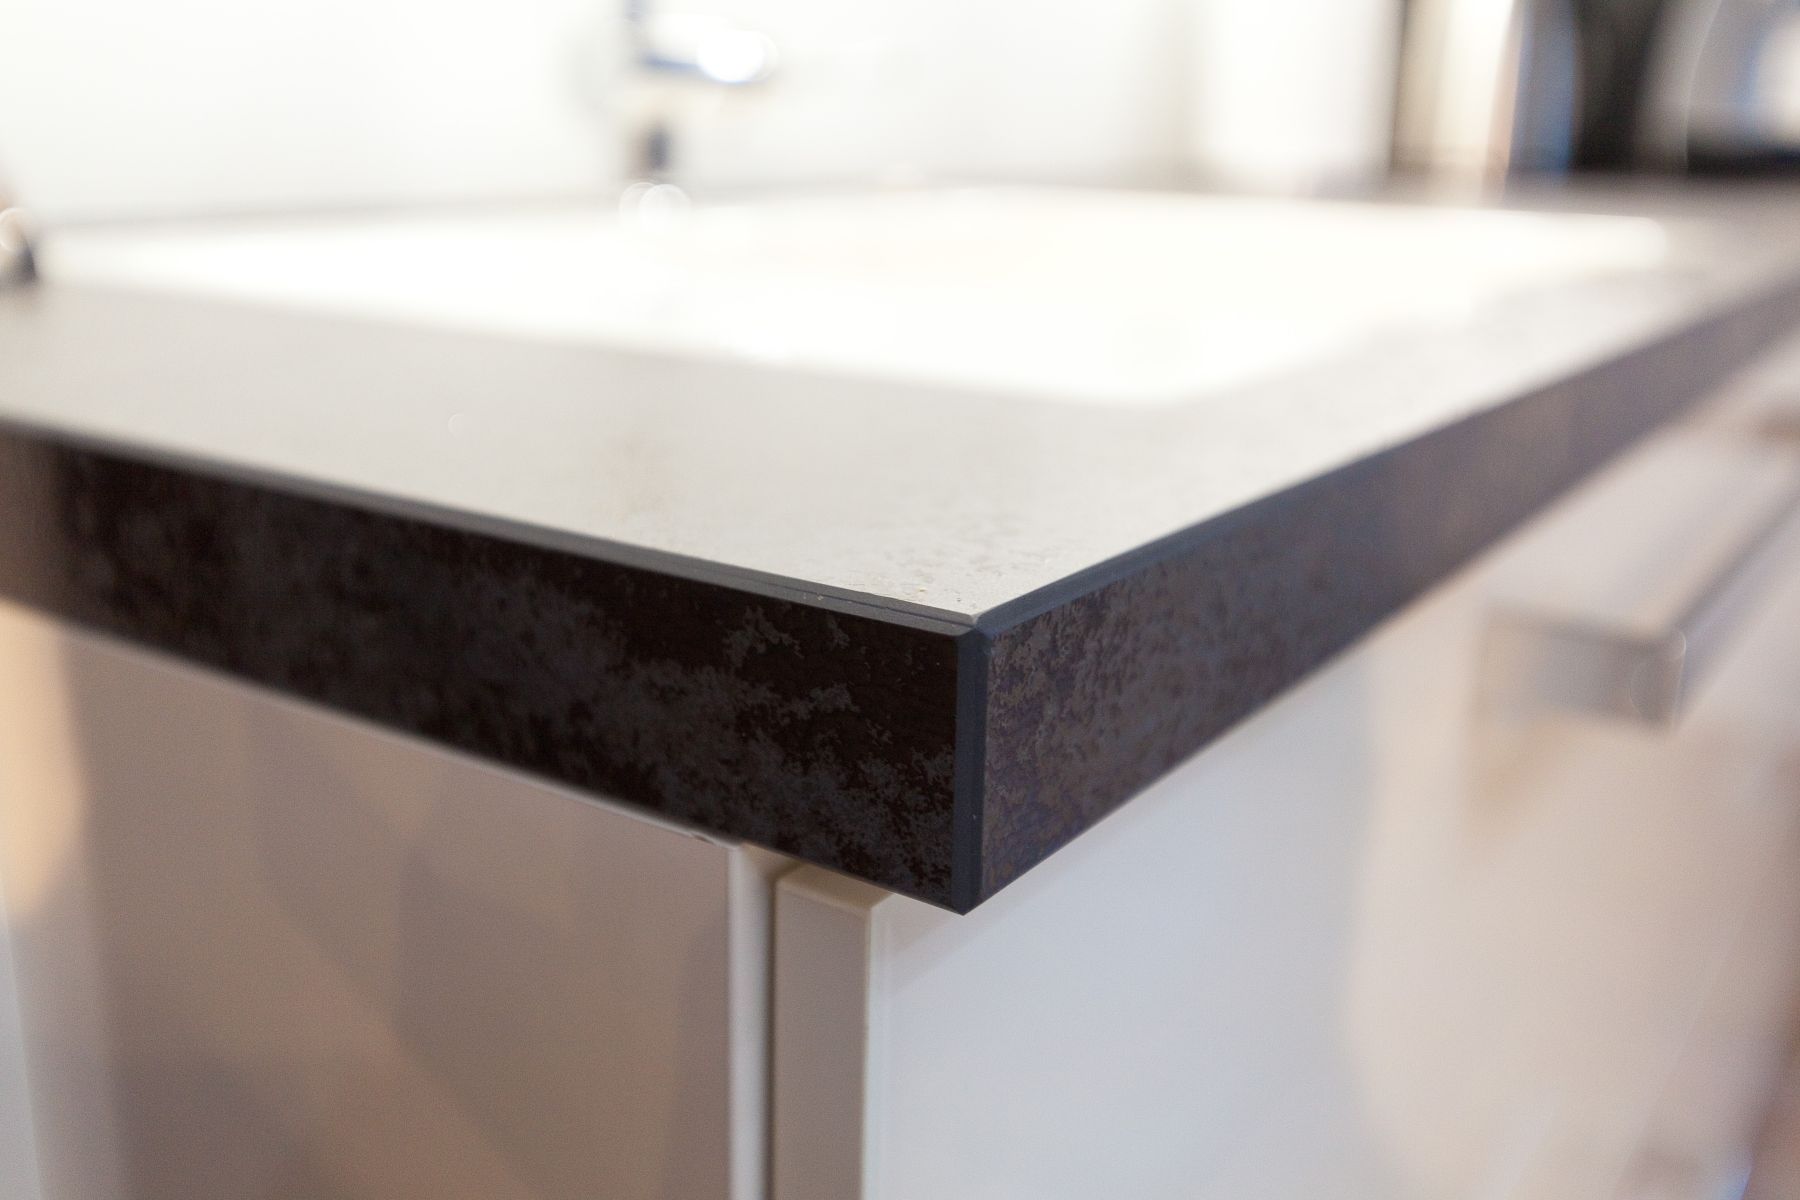 berbel dunstabzug trendy berbel glassline kche kchenzeile kcheninsel kochinsel kchenblock with. Black Bedroom Furniture Sets. Home Design Ideas